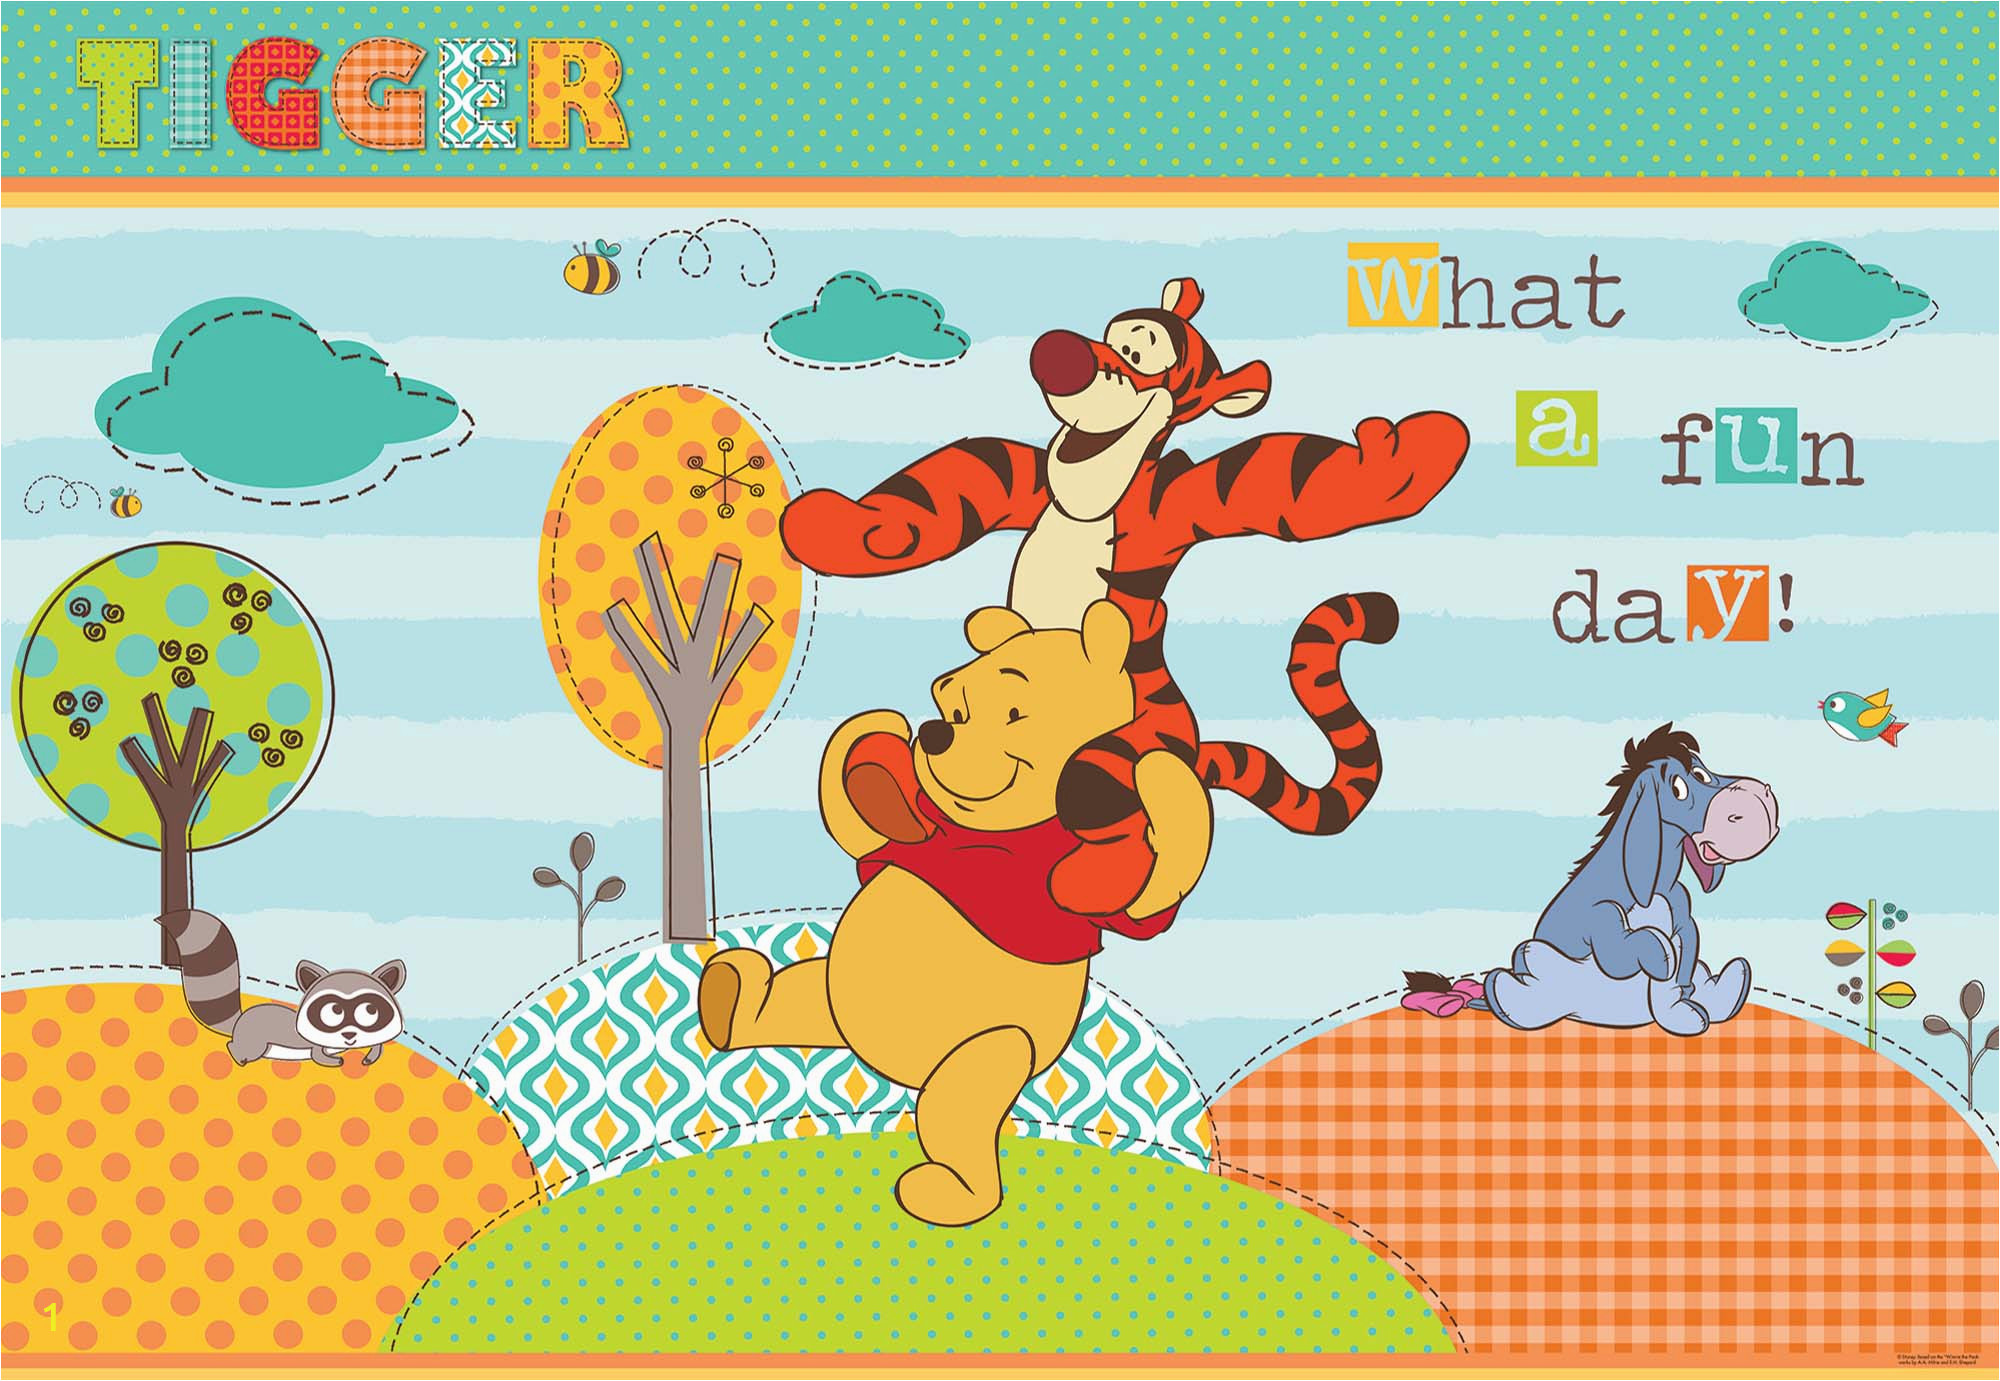 disney winnie the pooh wallpaper 1 p